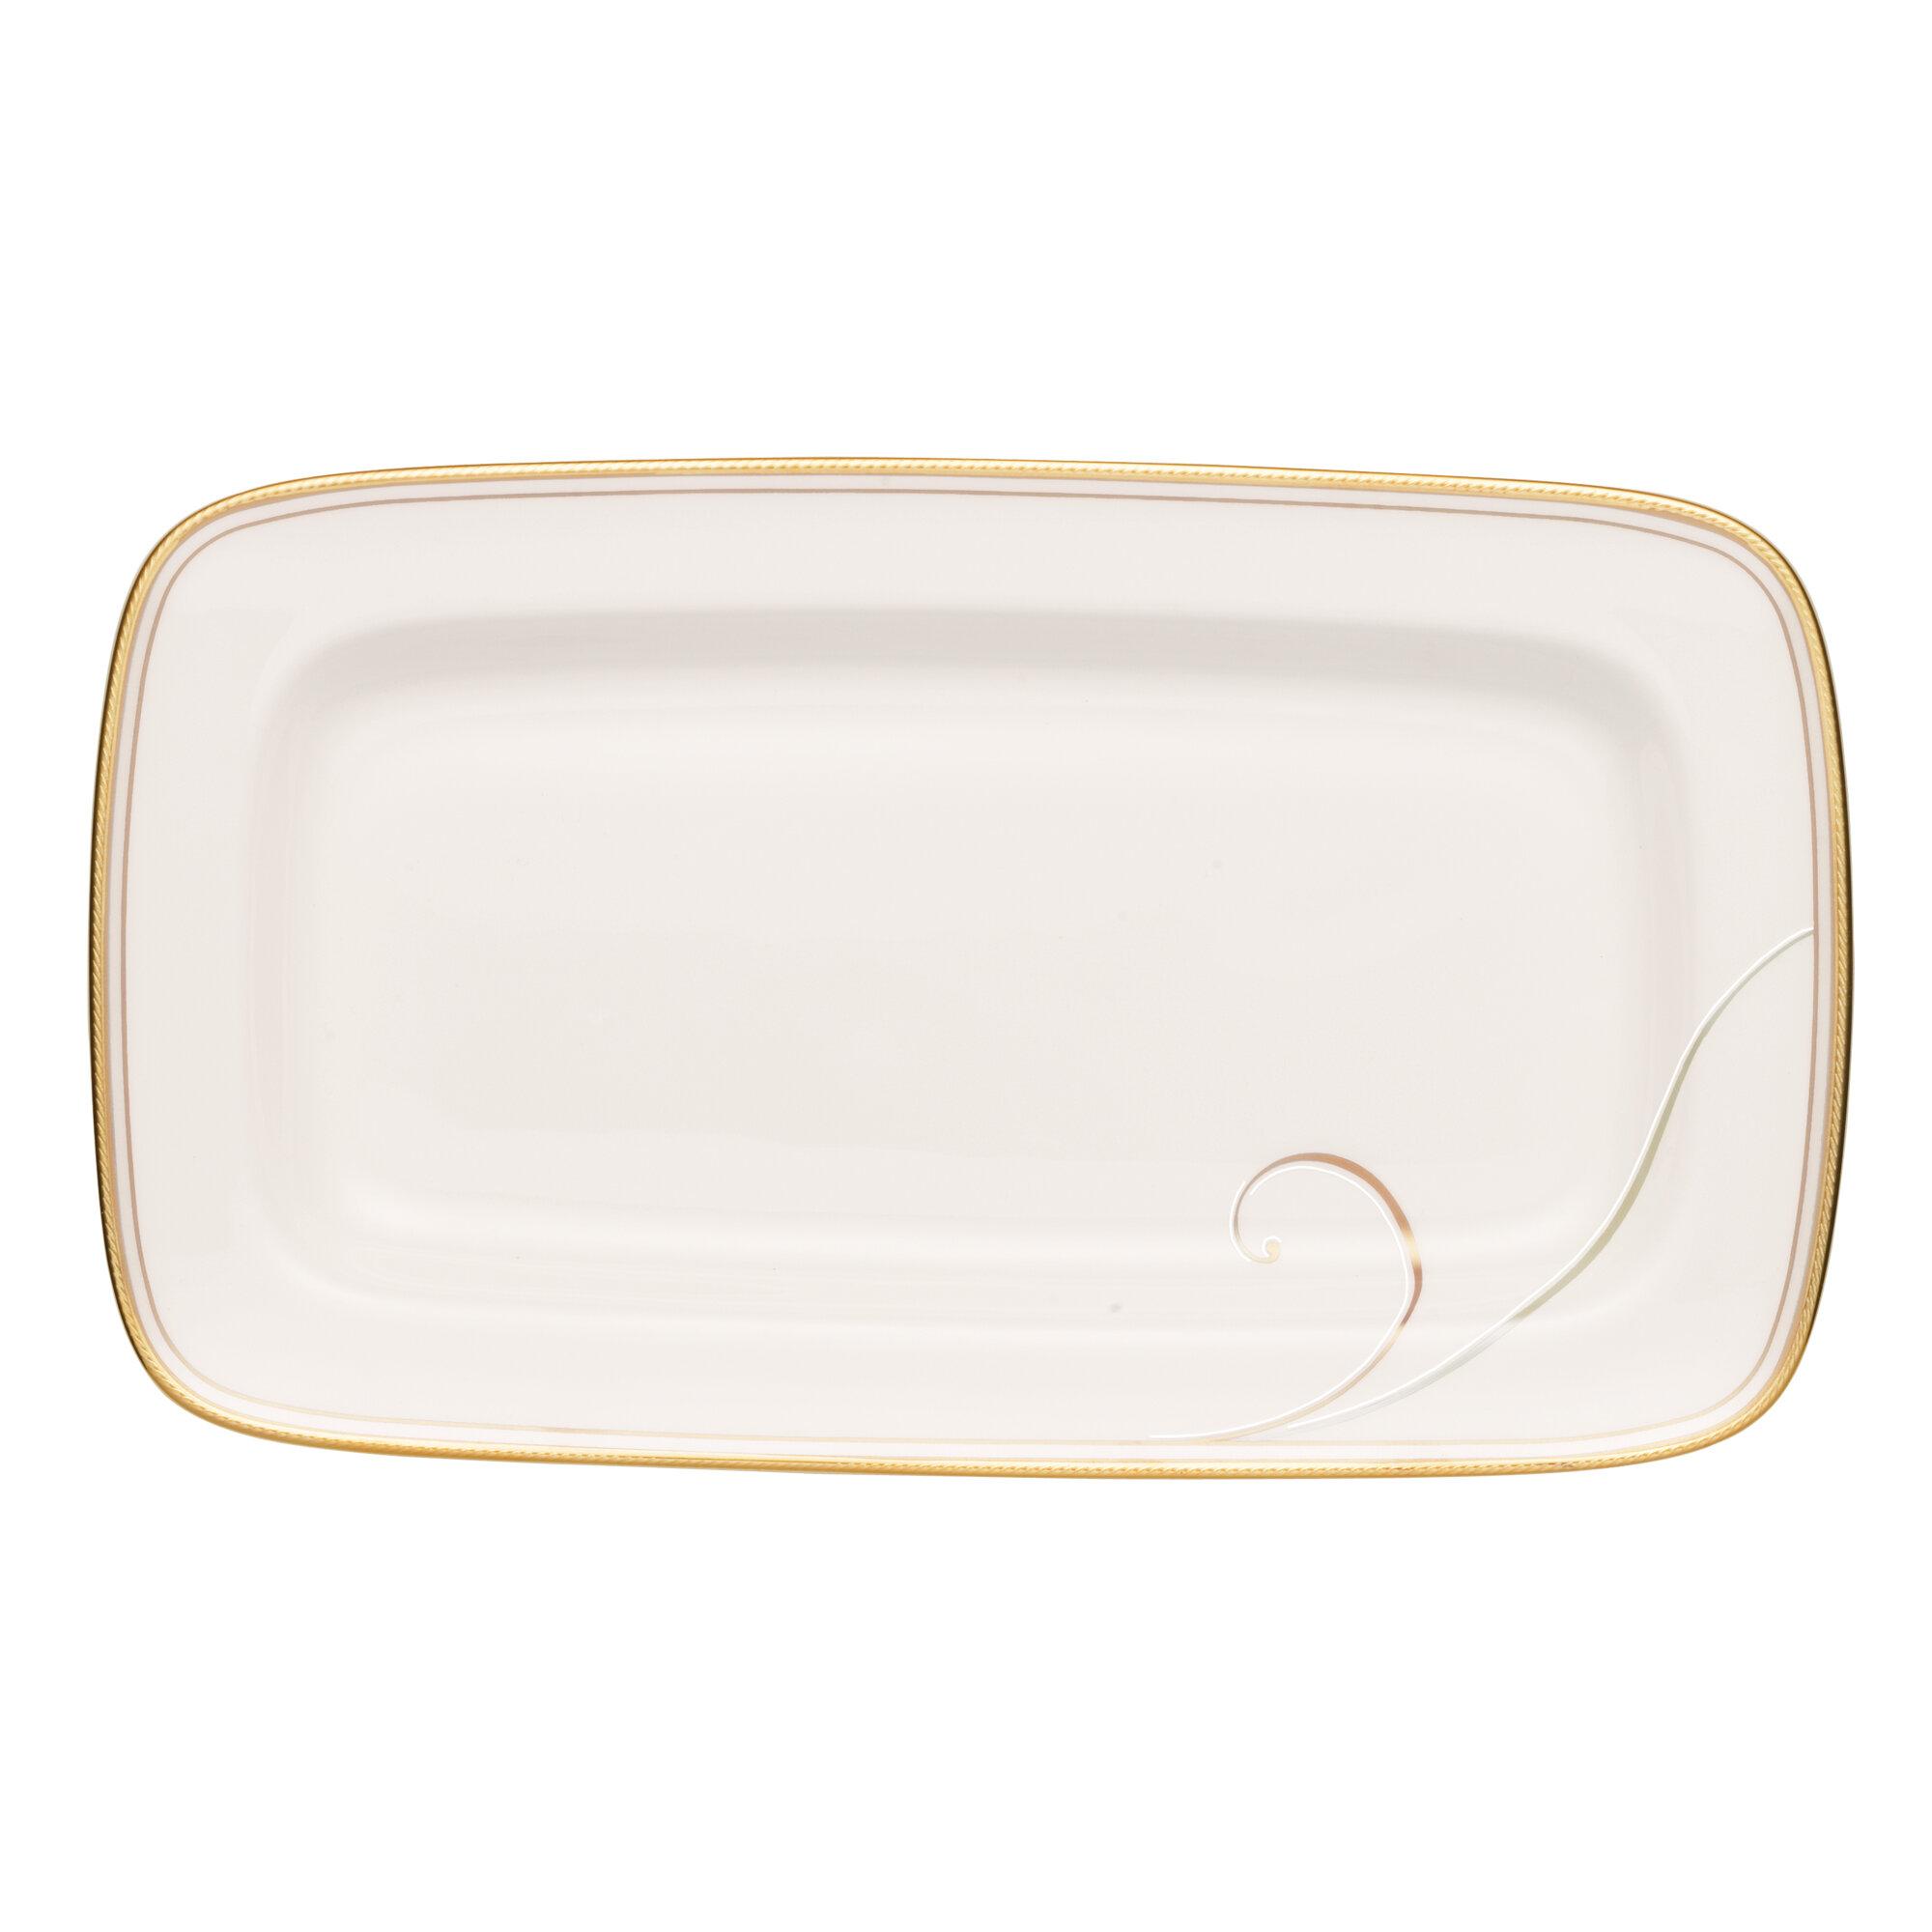 Noritake Golden Wave Butter Dish Wayfair